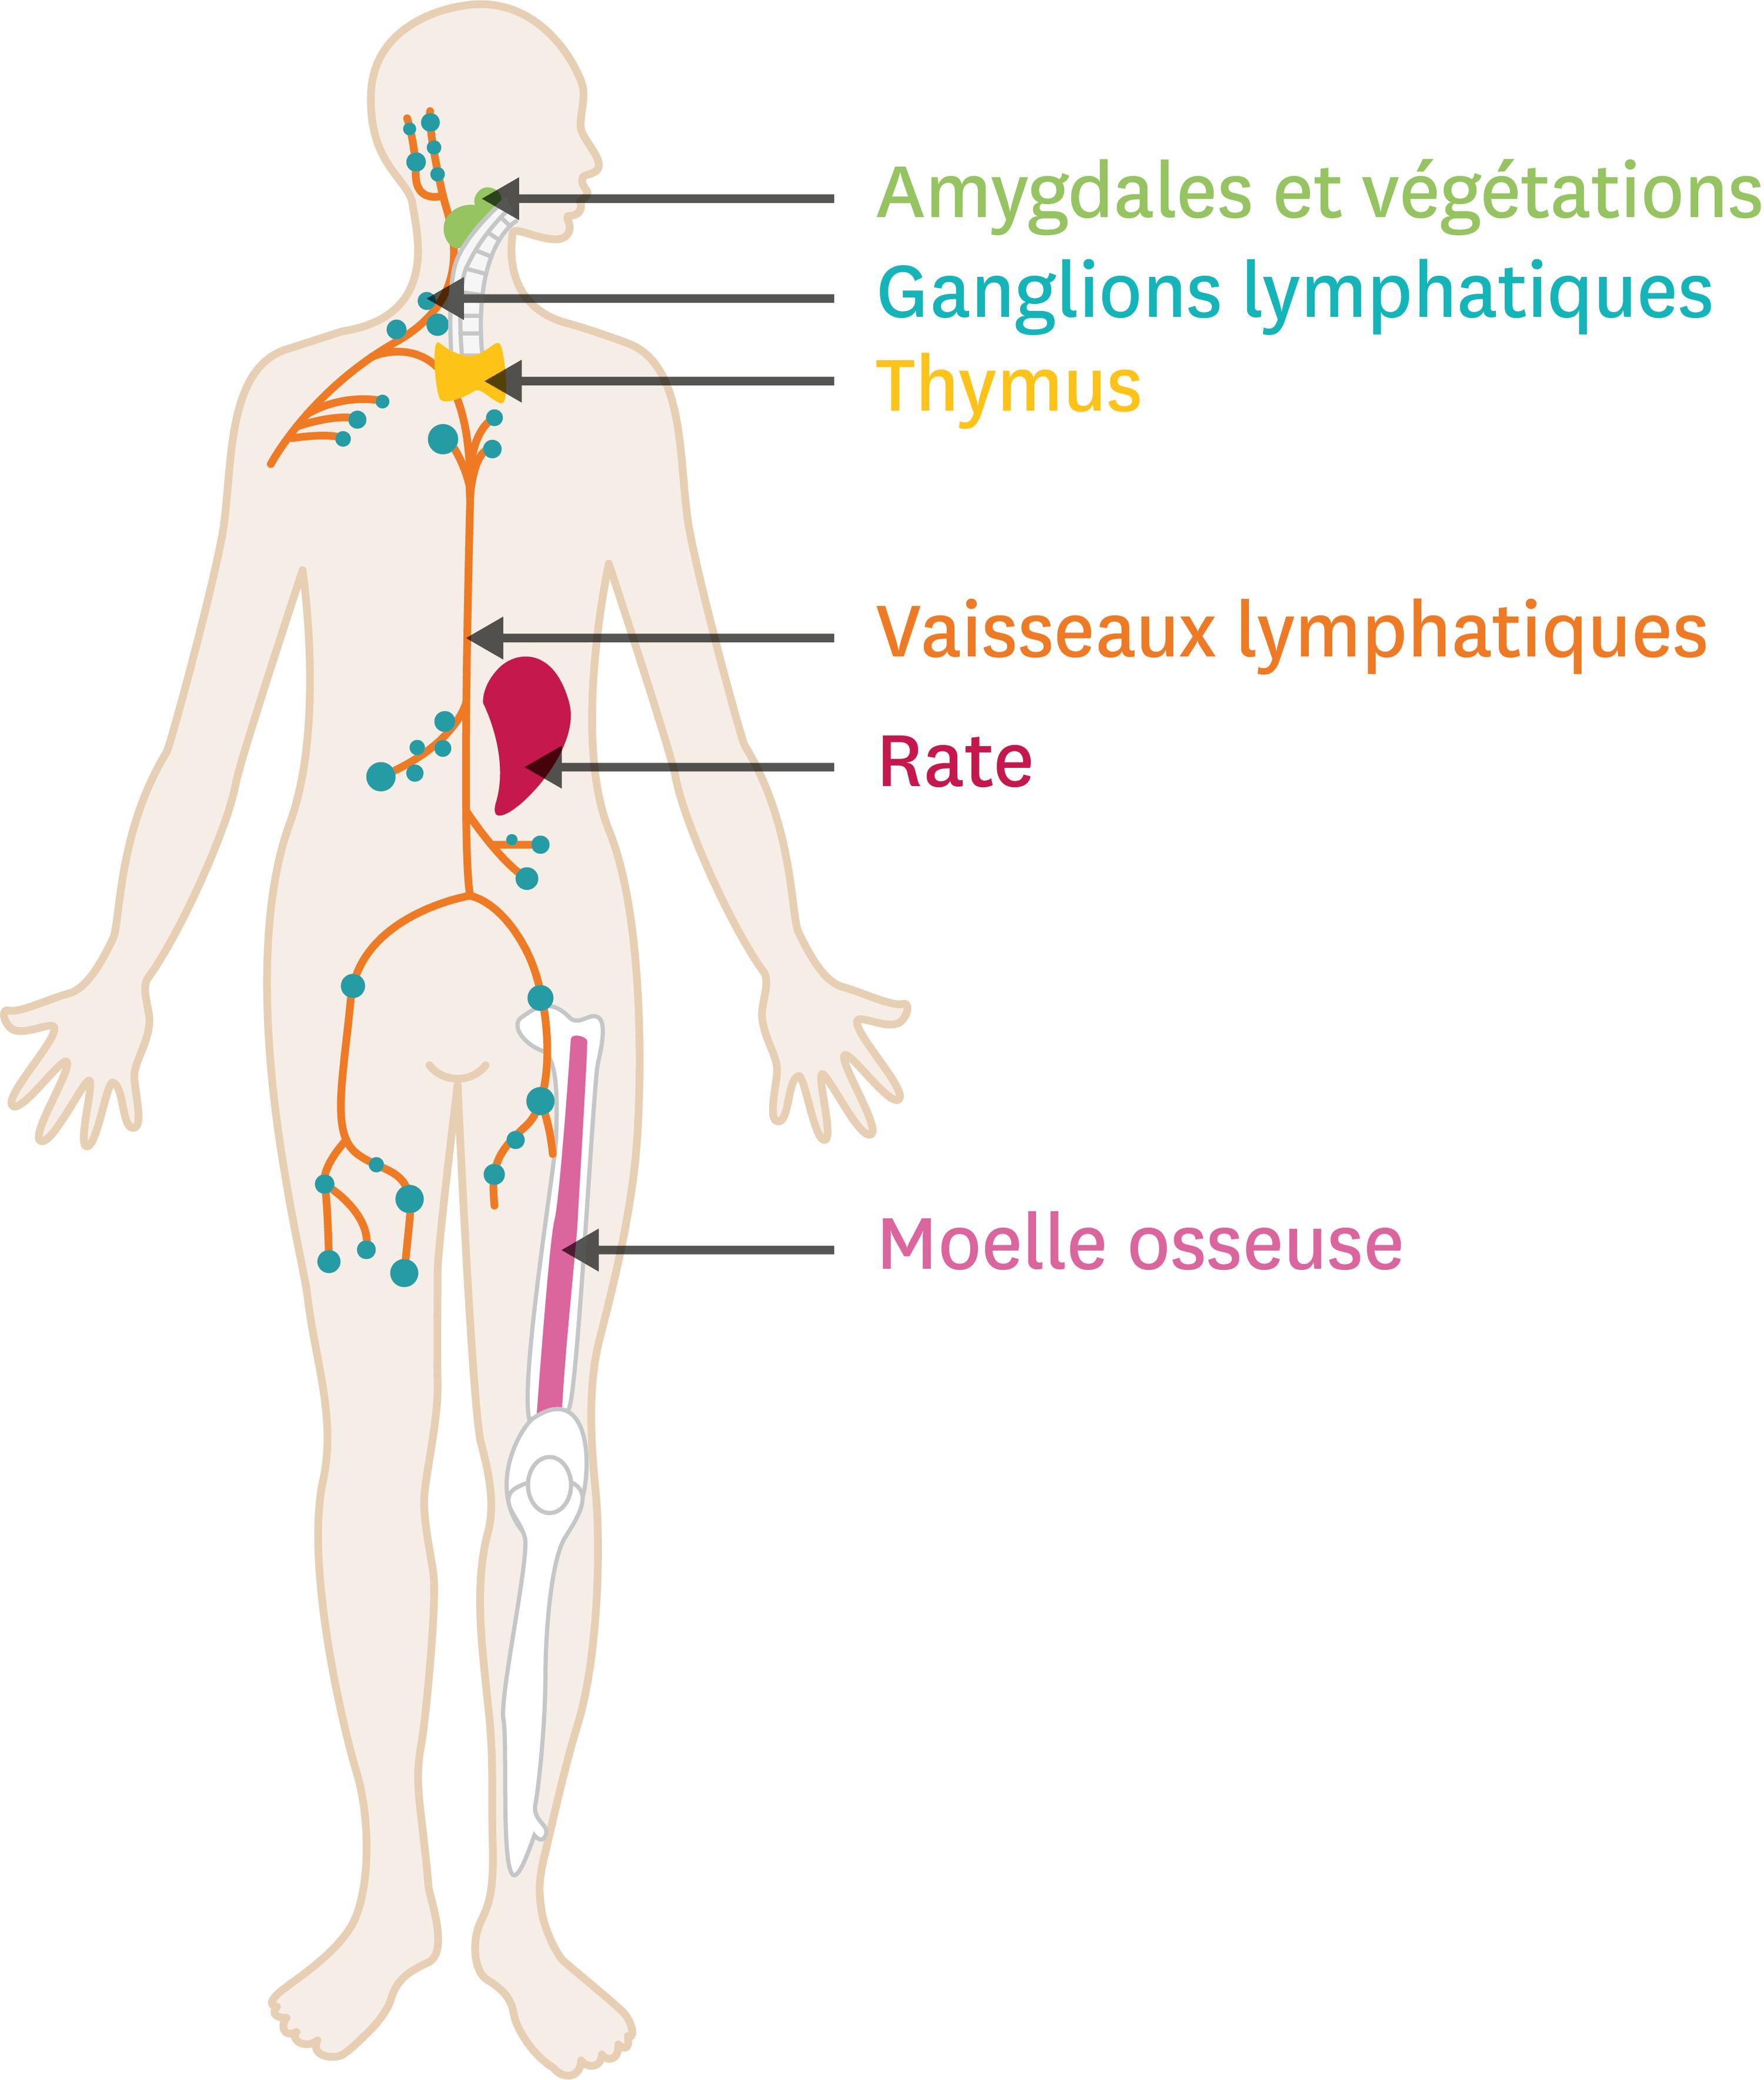 <stamp theme='svt-green1'>Doc. 6</stamp> La localisation des organes du système immunitaire.